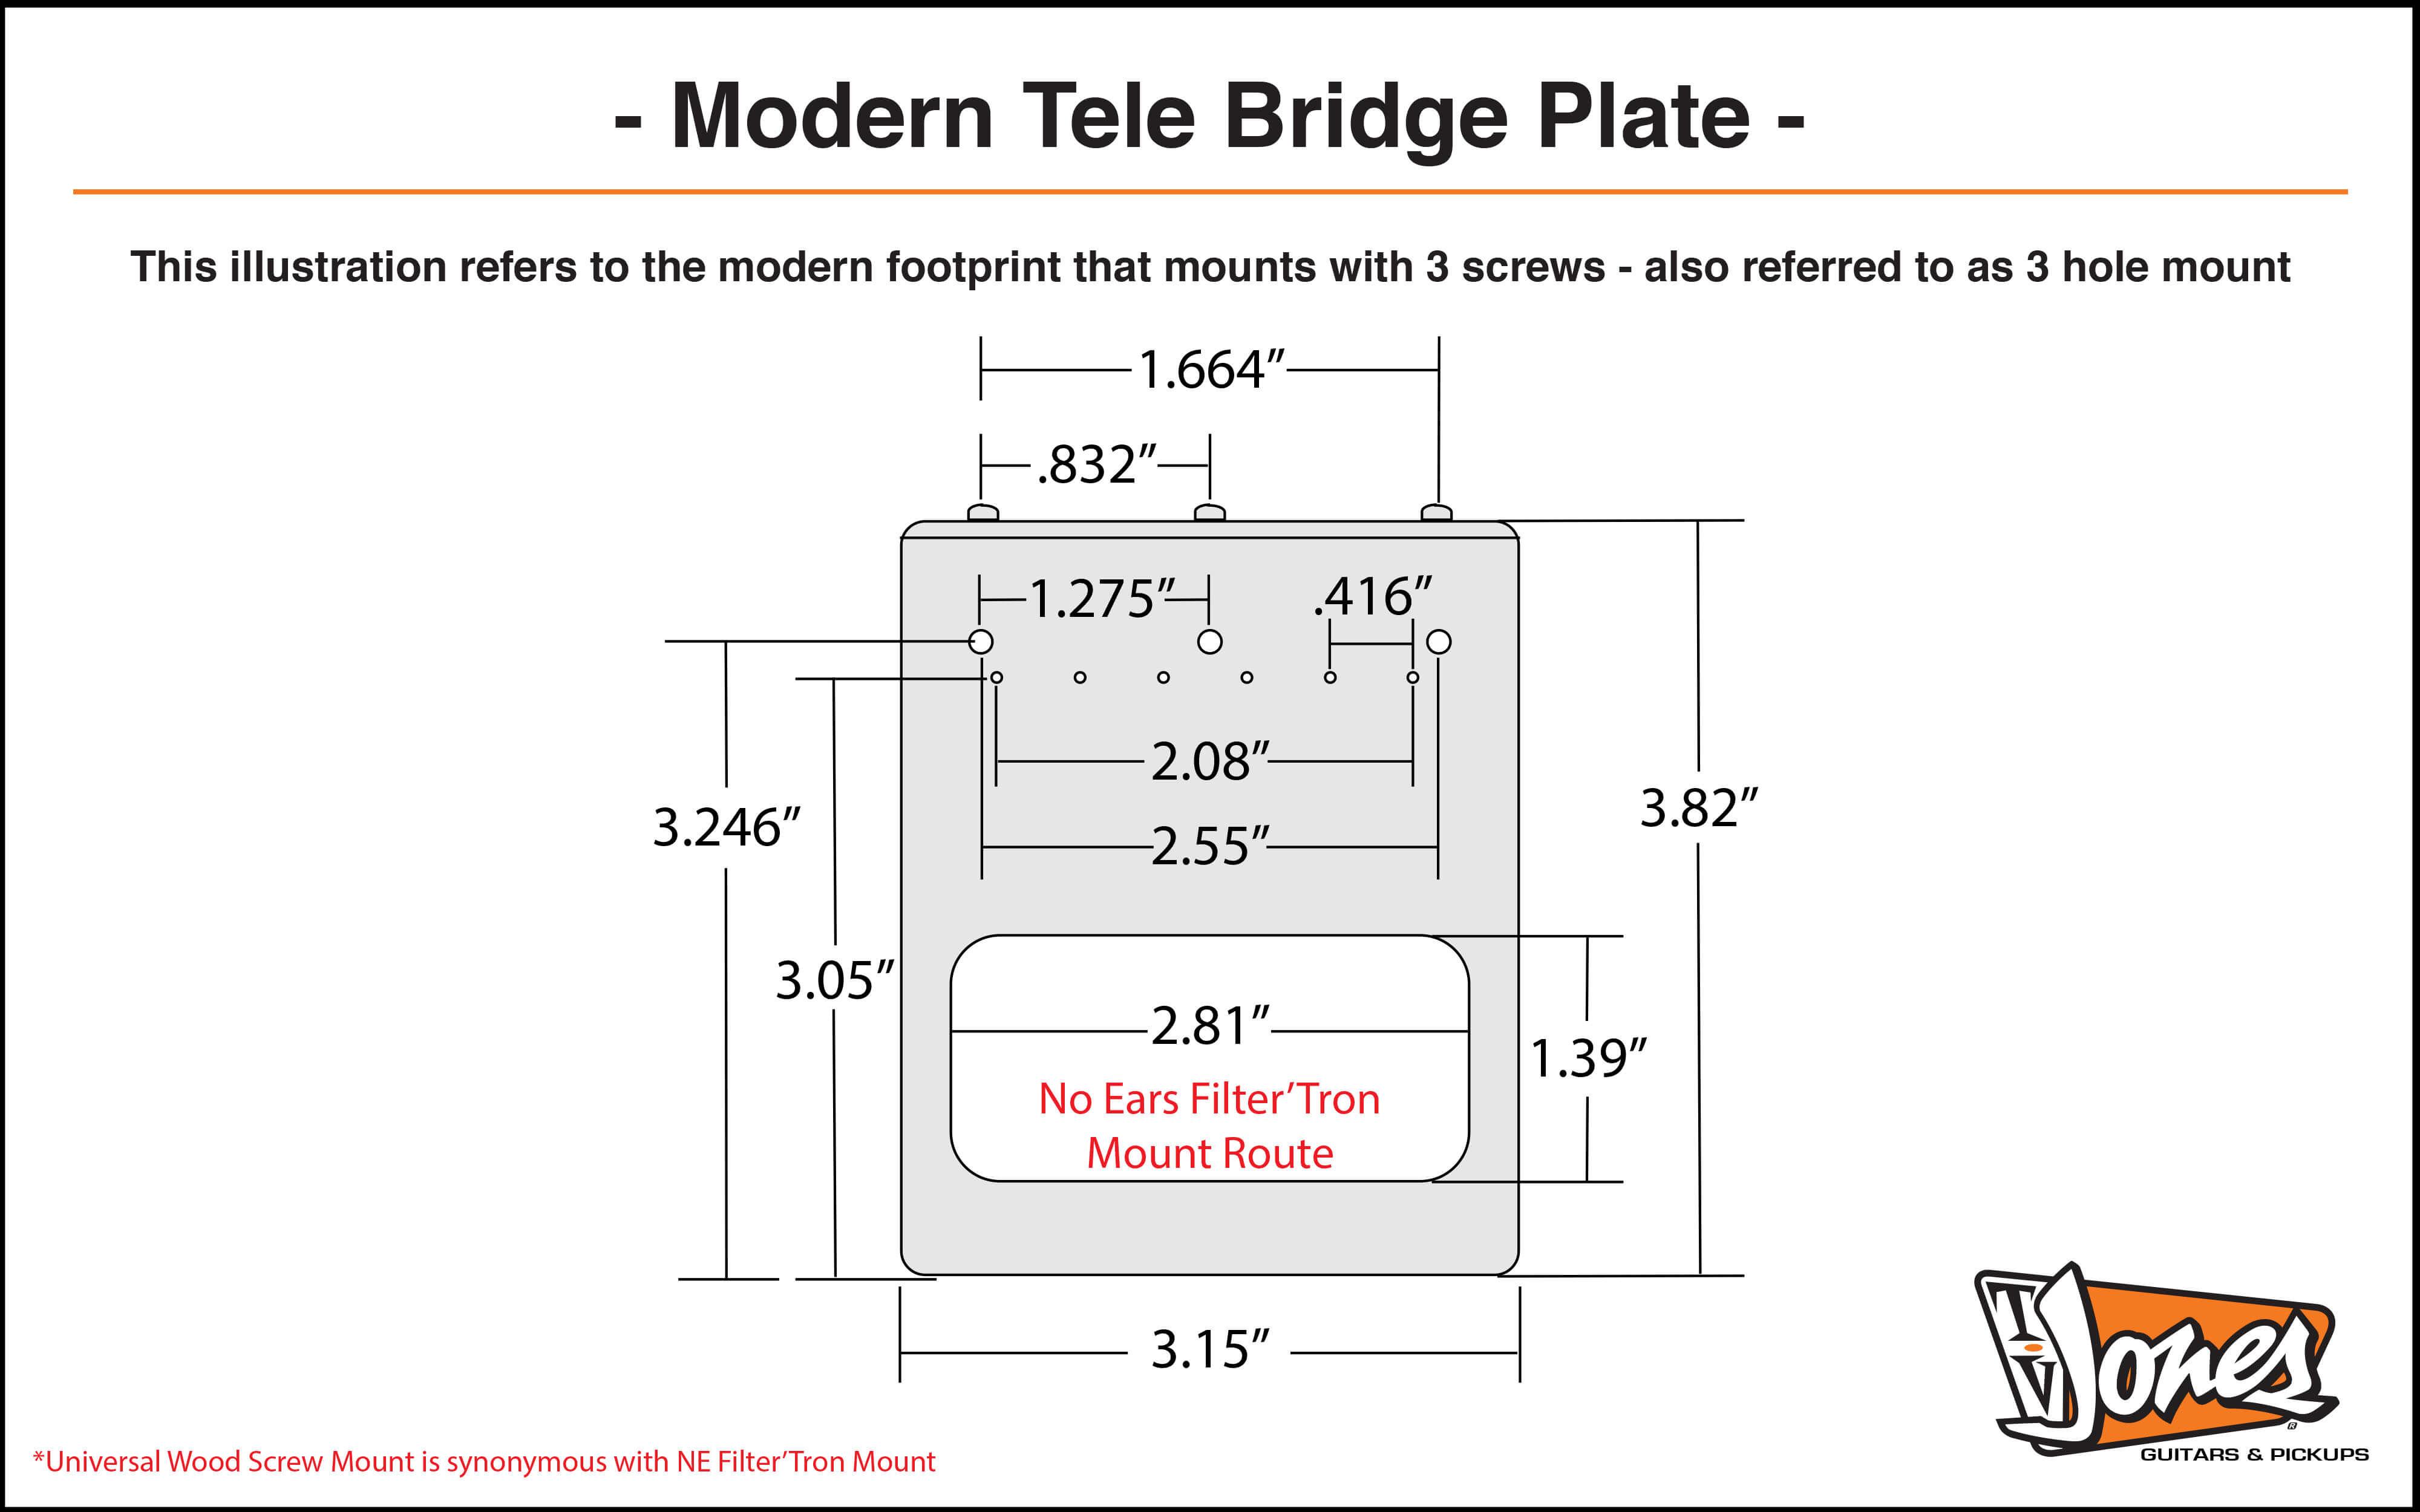 Modern Tele Plate Dimensions